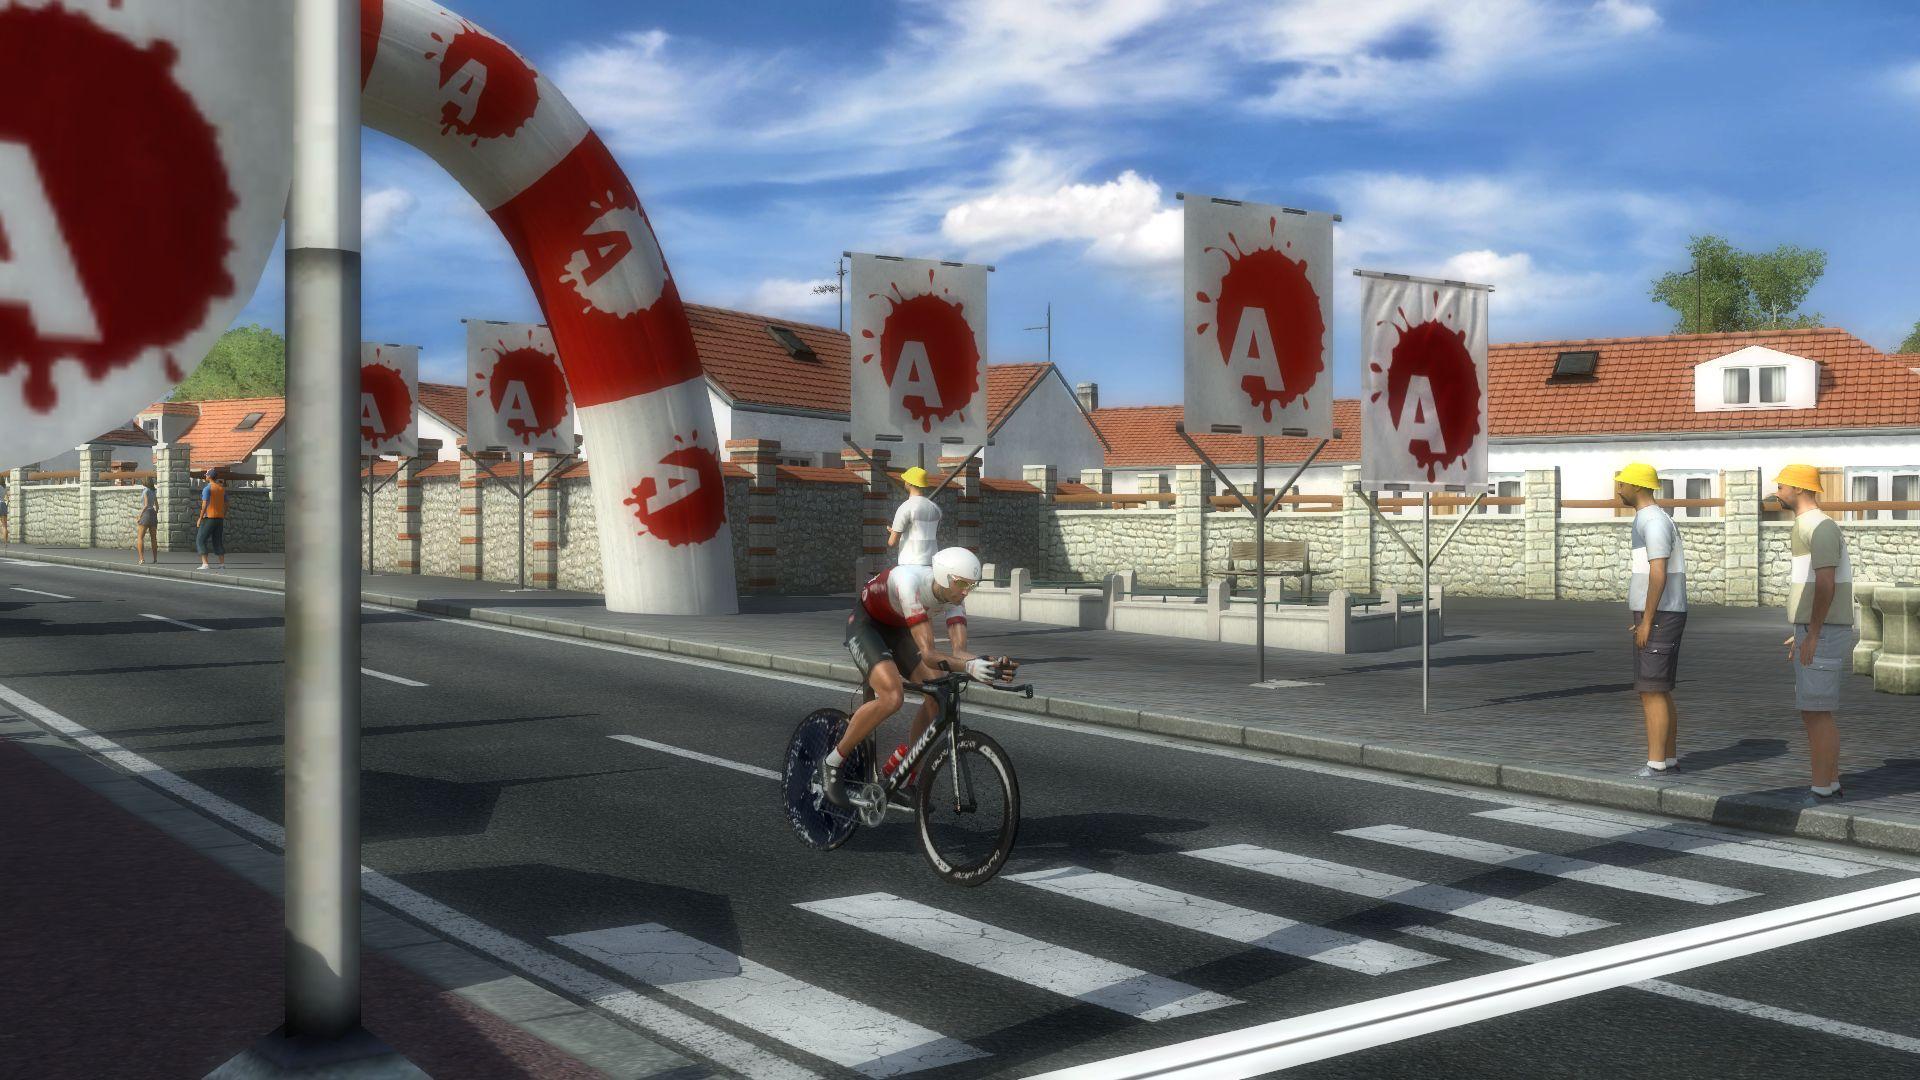 pcmdaily.com/images/mg/2019/Races/C1/Bayern/S4/mg19_bay_s04_24.jpg